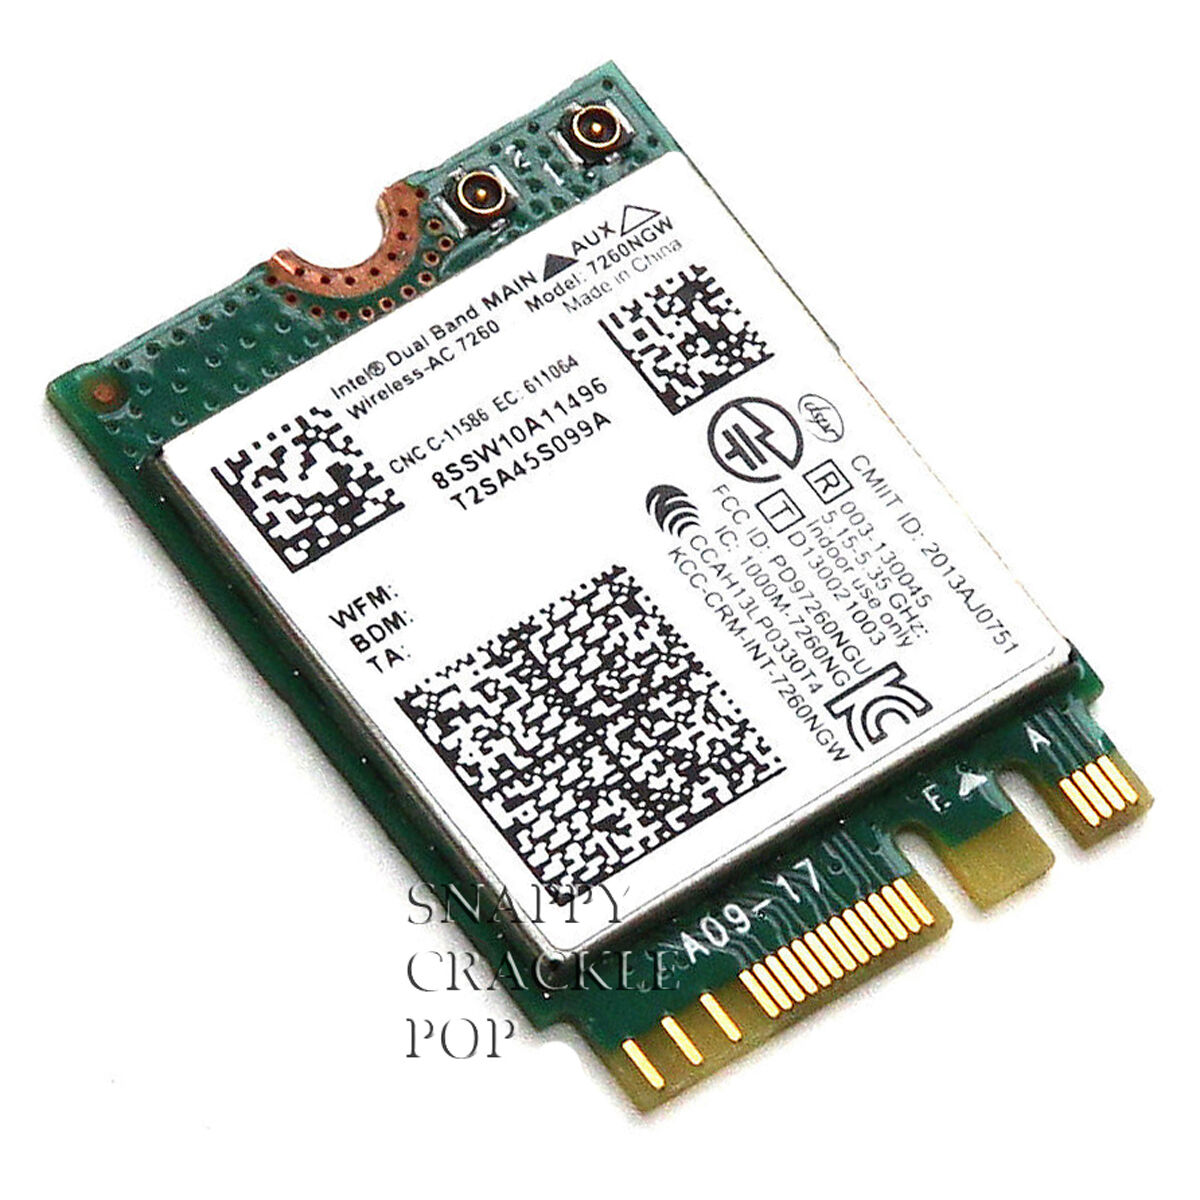 HP Spectre 13 Ultrabook Intel 7260NGW Dual Band Wireless AC Bluetooth 4.0 Card